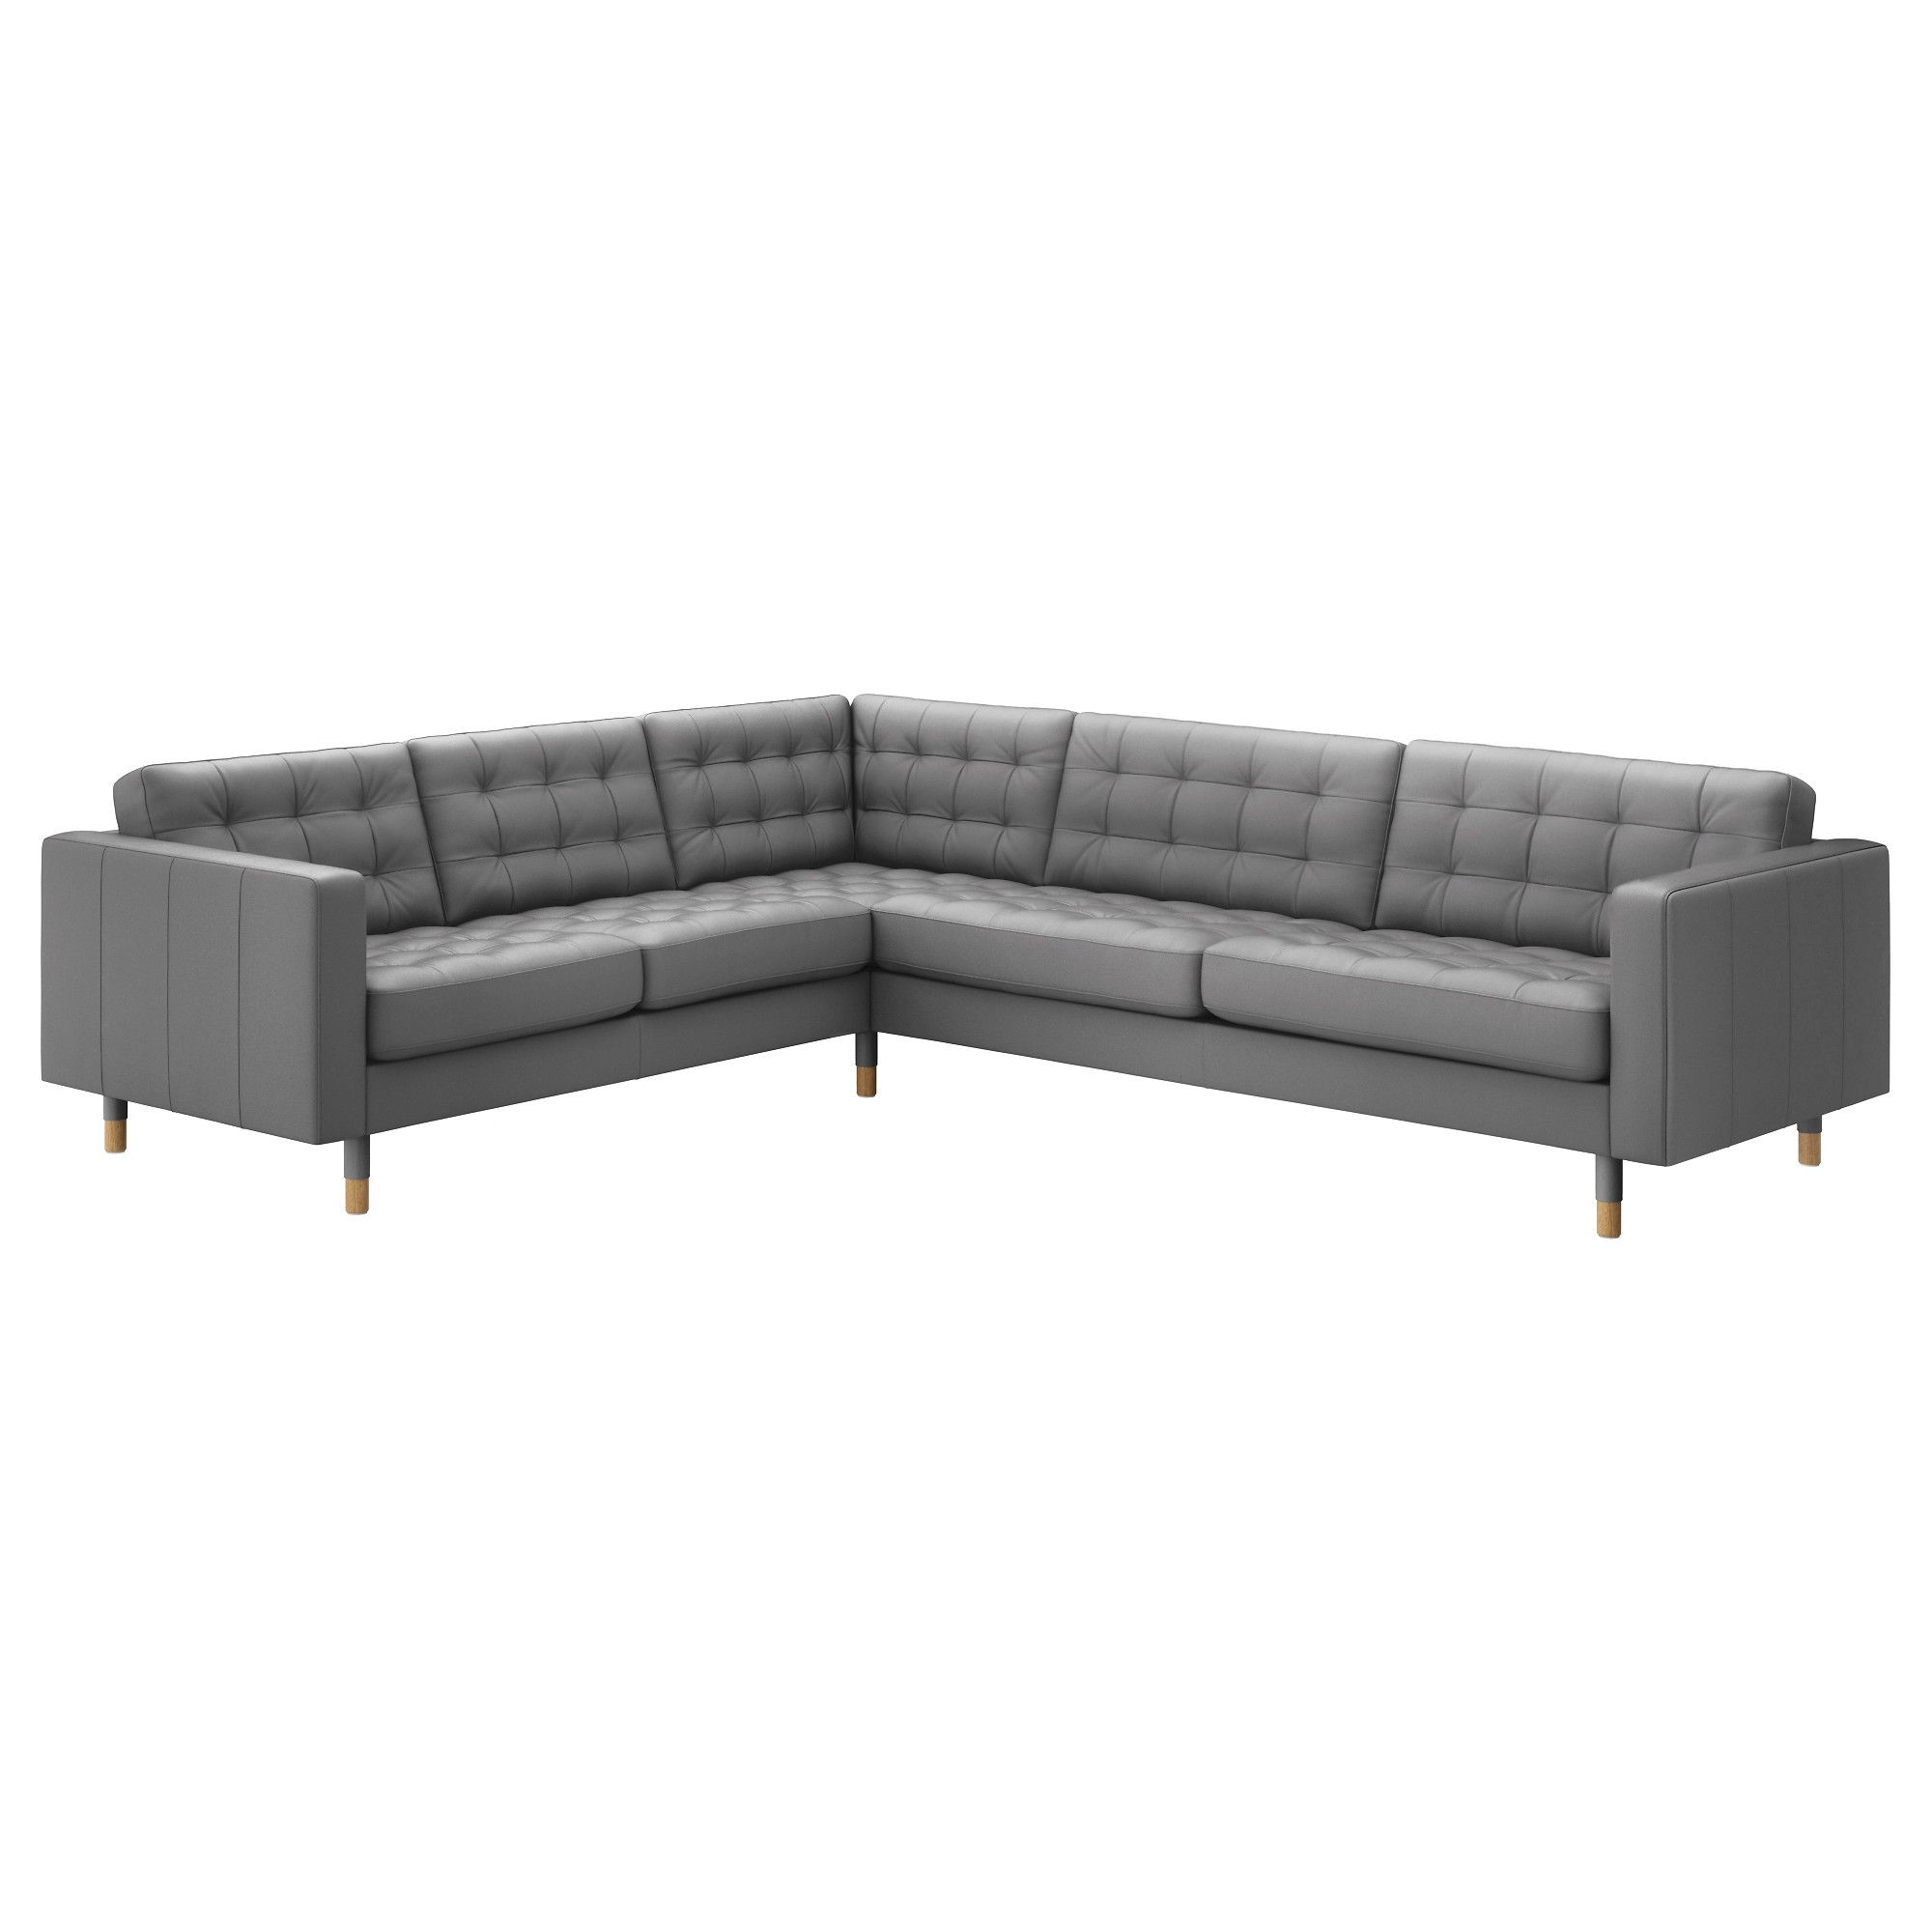 Ikea Us Furniture And Home Furnishings Home Design Living Room Corner Sofa Landskrona